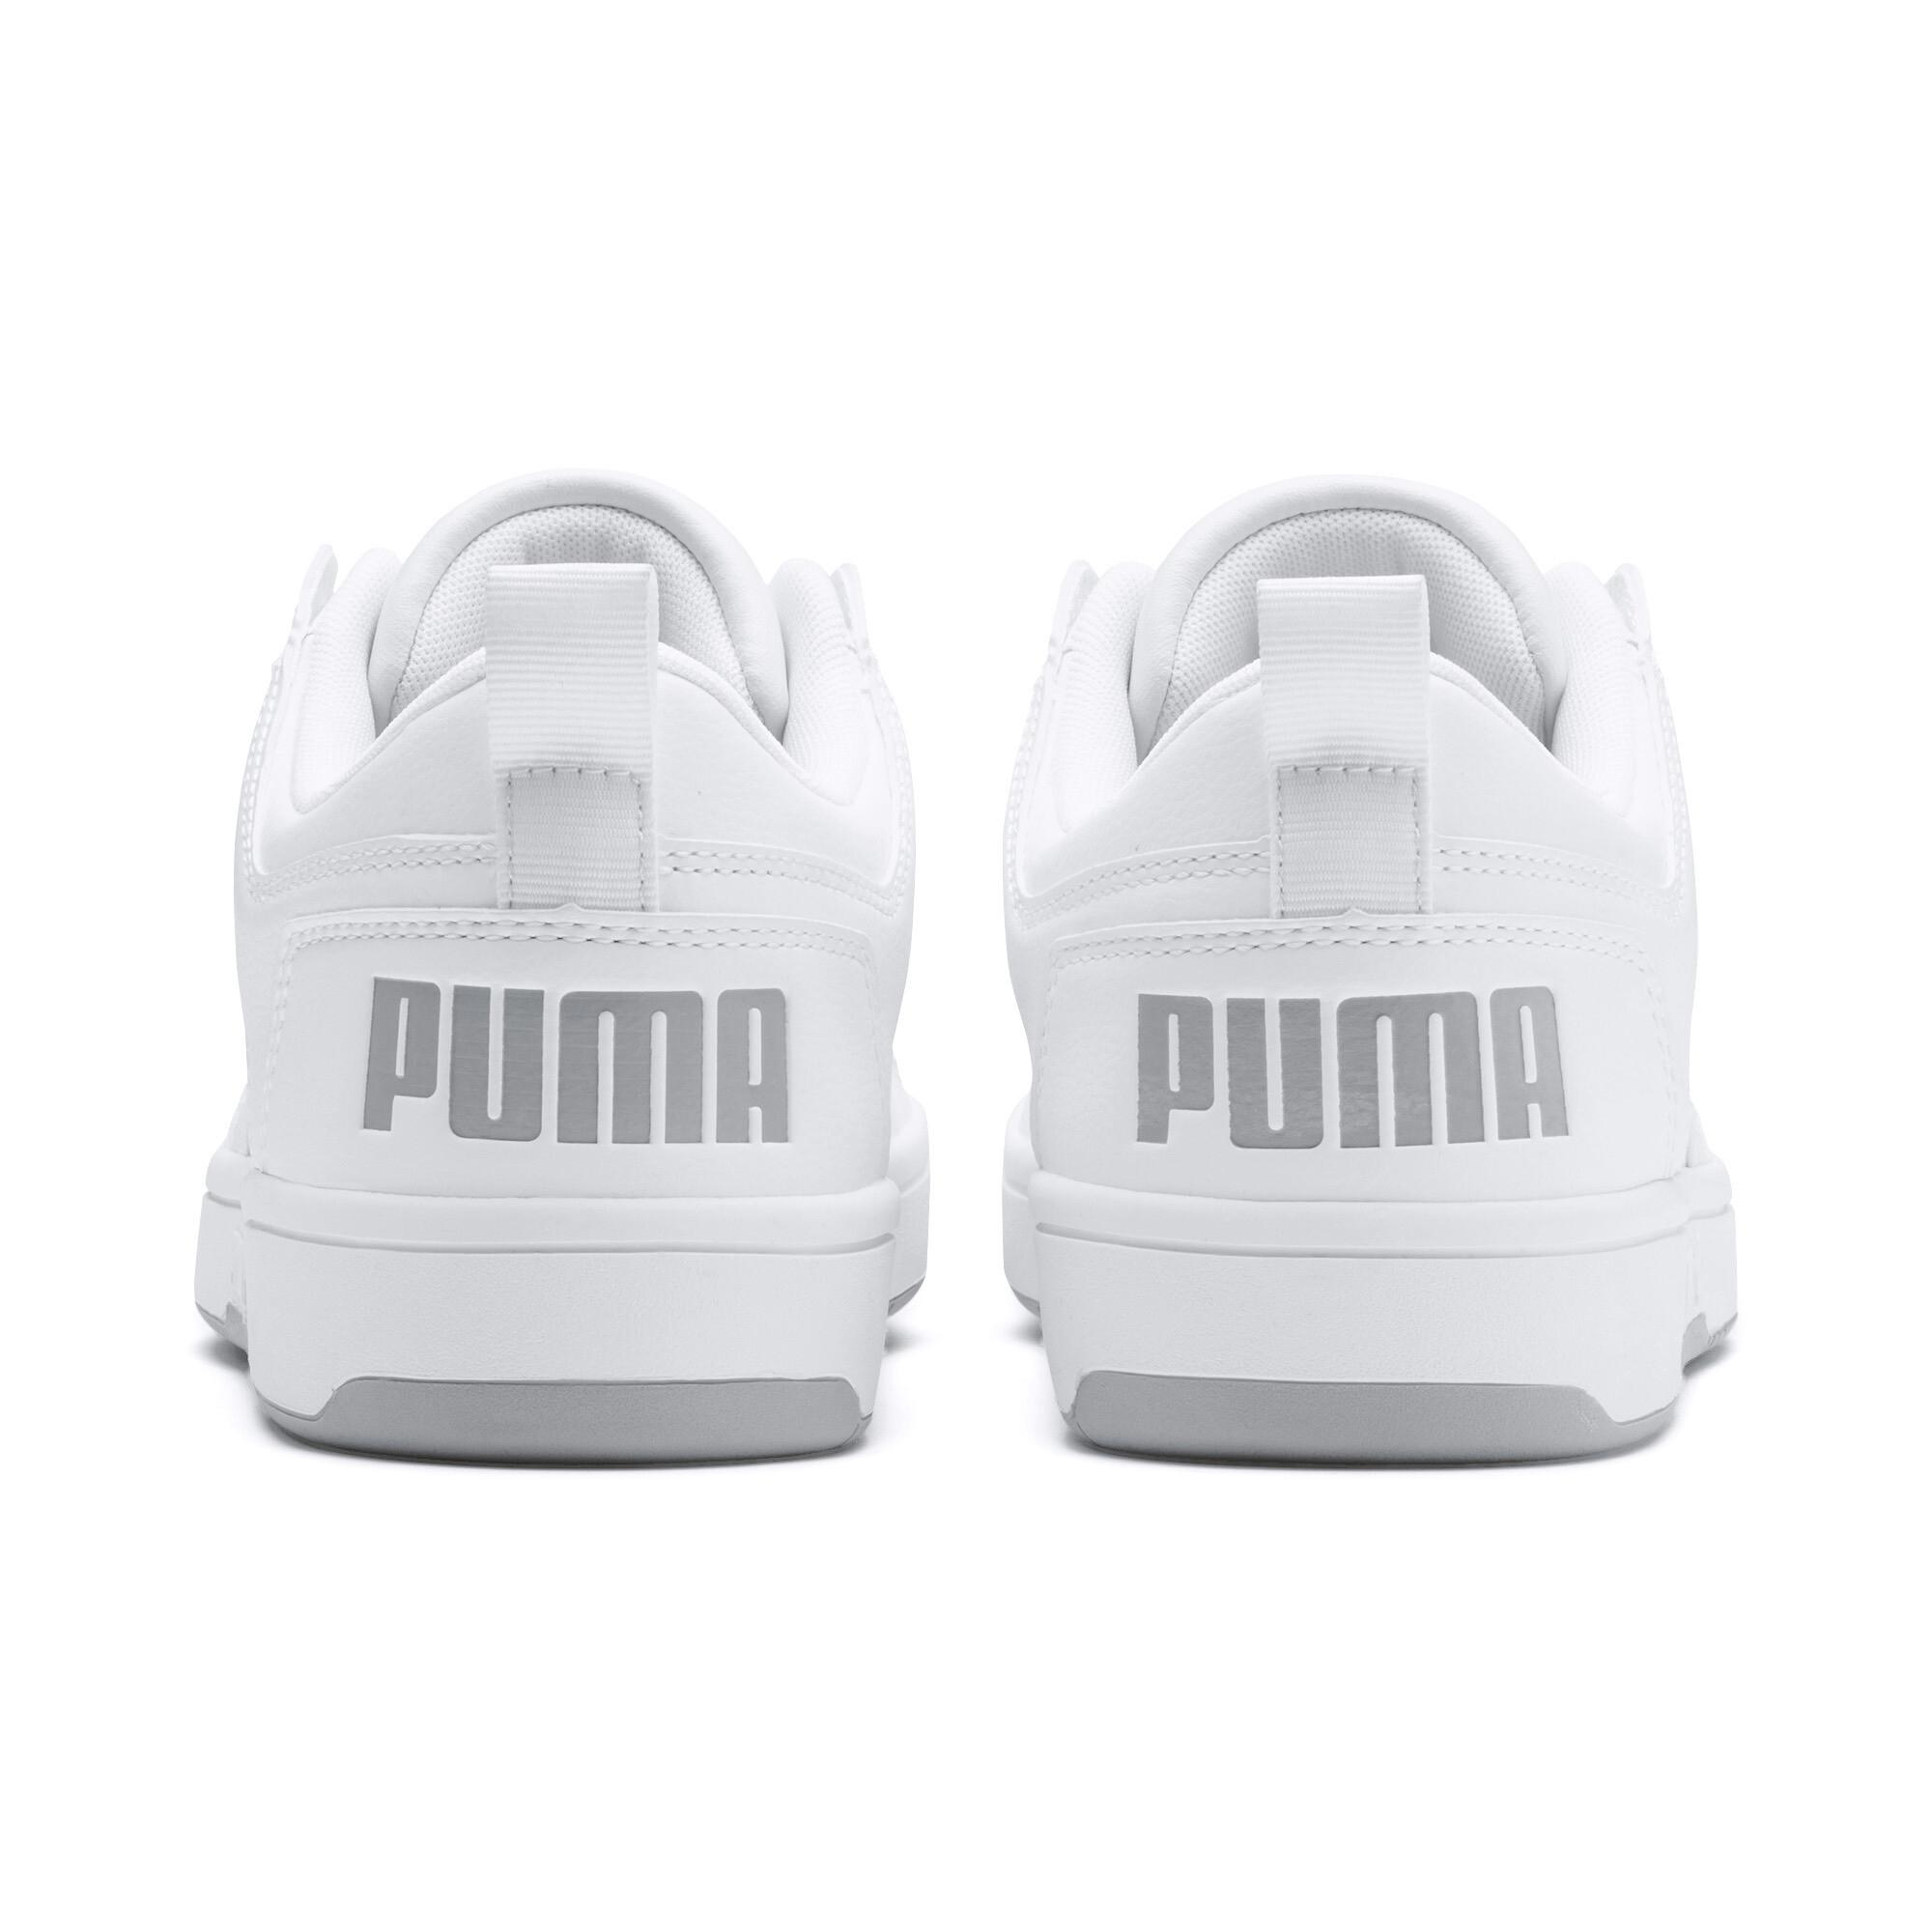 PUMA-PUMA-Rebound-LayUp-Lo-Men-039-s-Sneakers-Men-Shoe-Basics miniatura 3